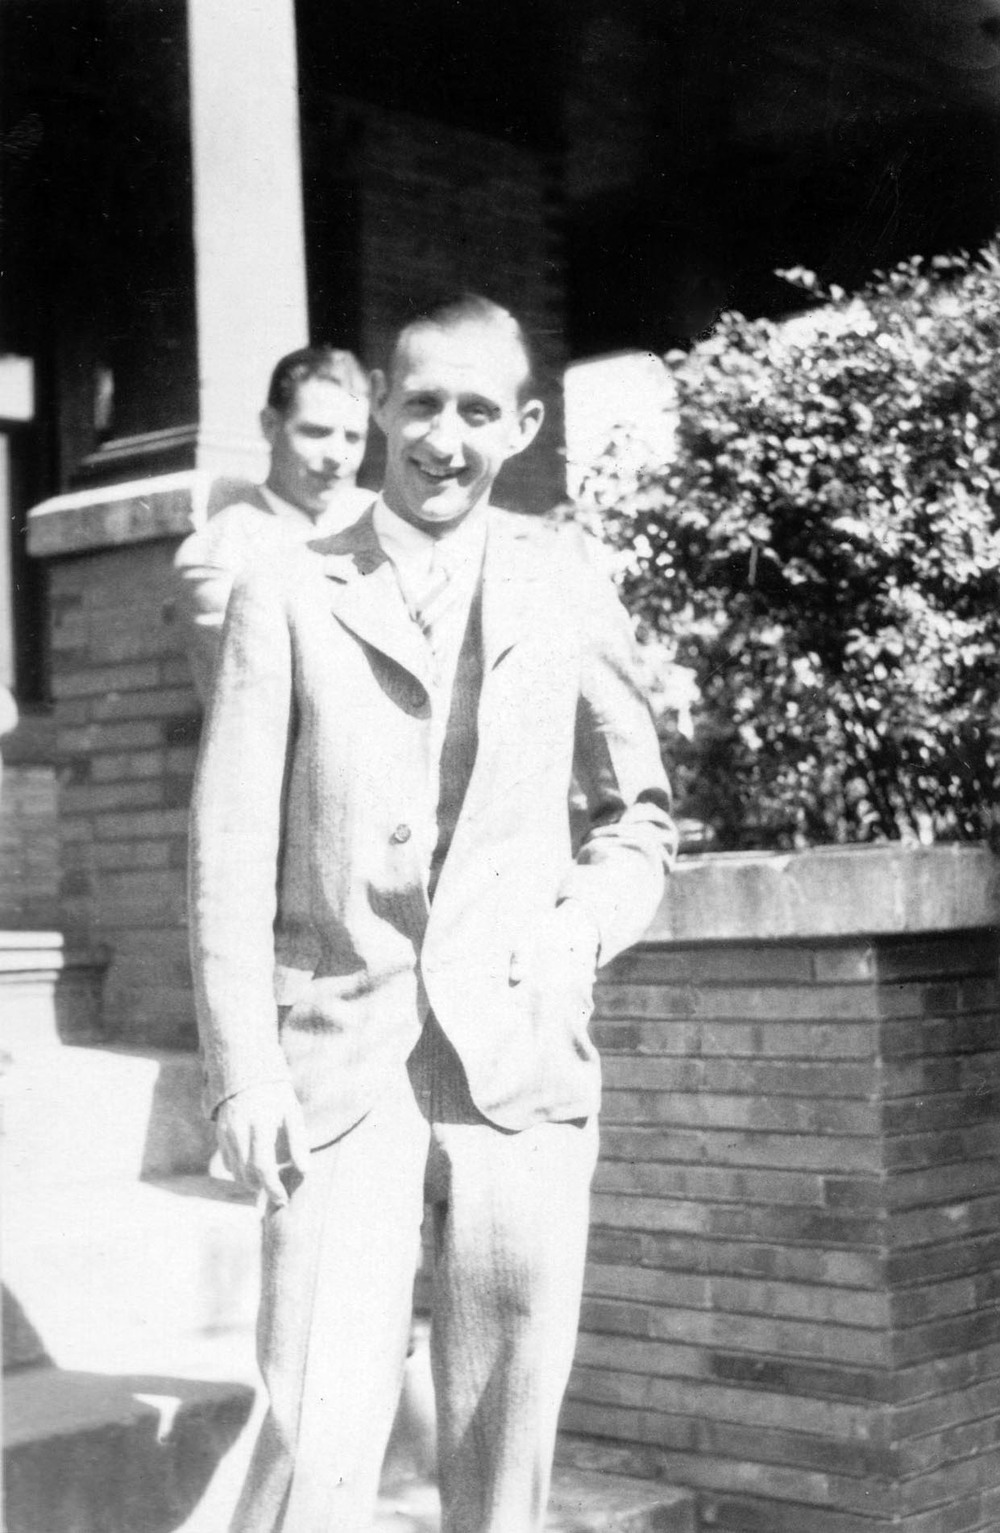 Earl R. Maize 1927